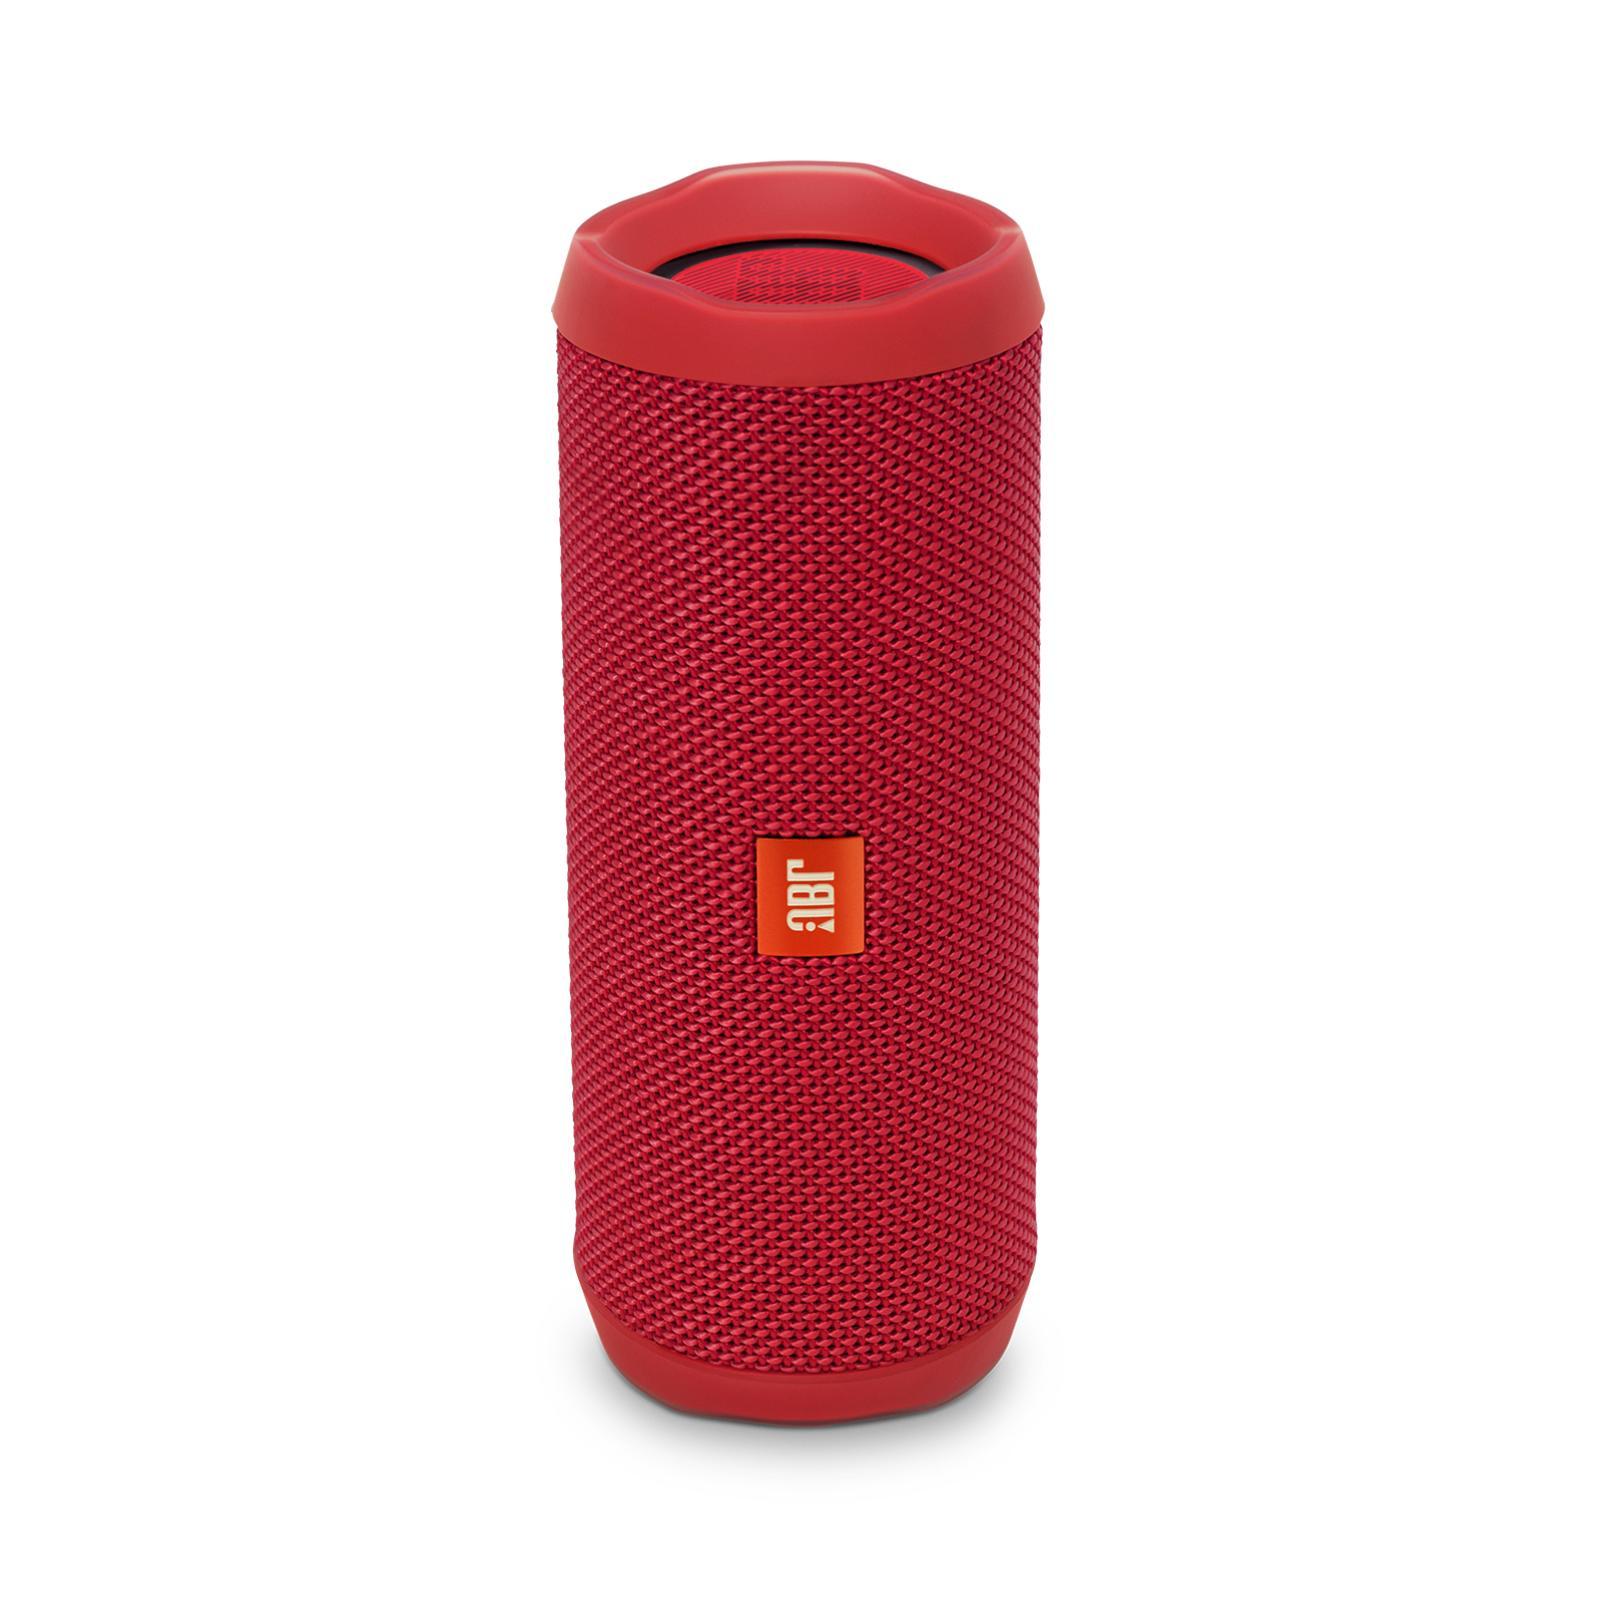 JBL FLIP 4 Waterproof Portable Speaker with